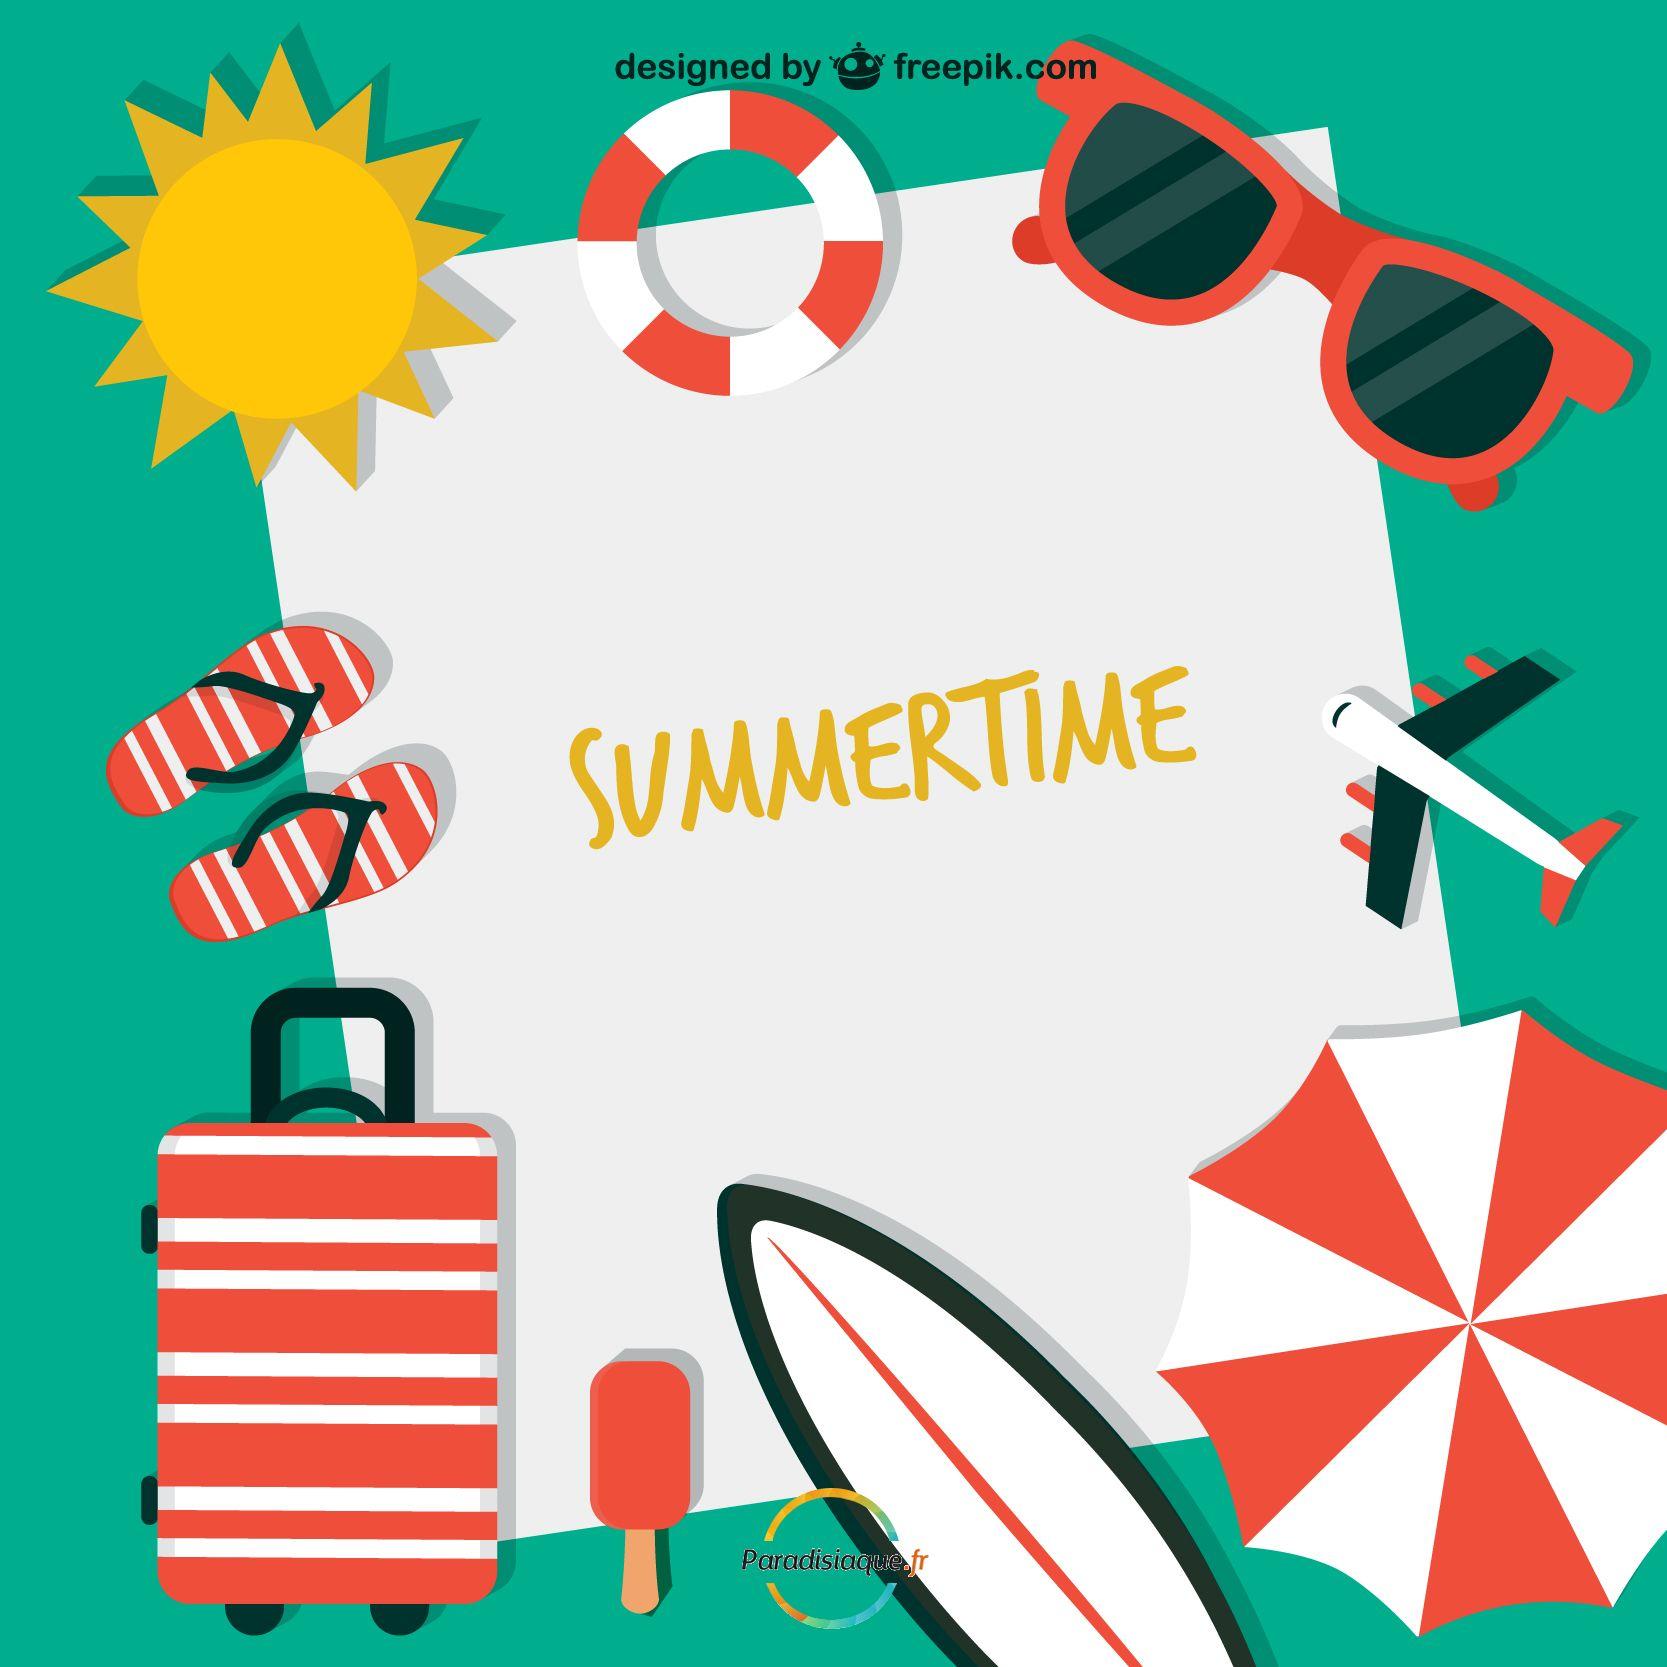 Créer un album photo de vos vacances